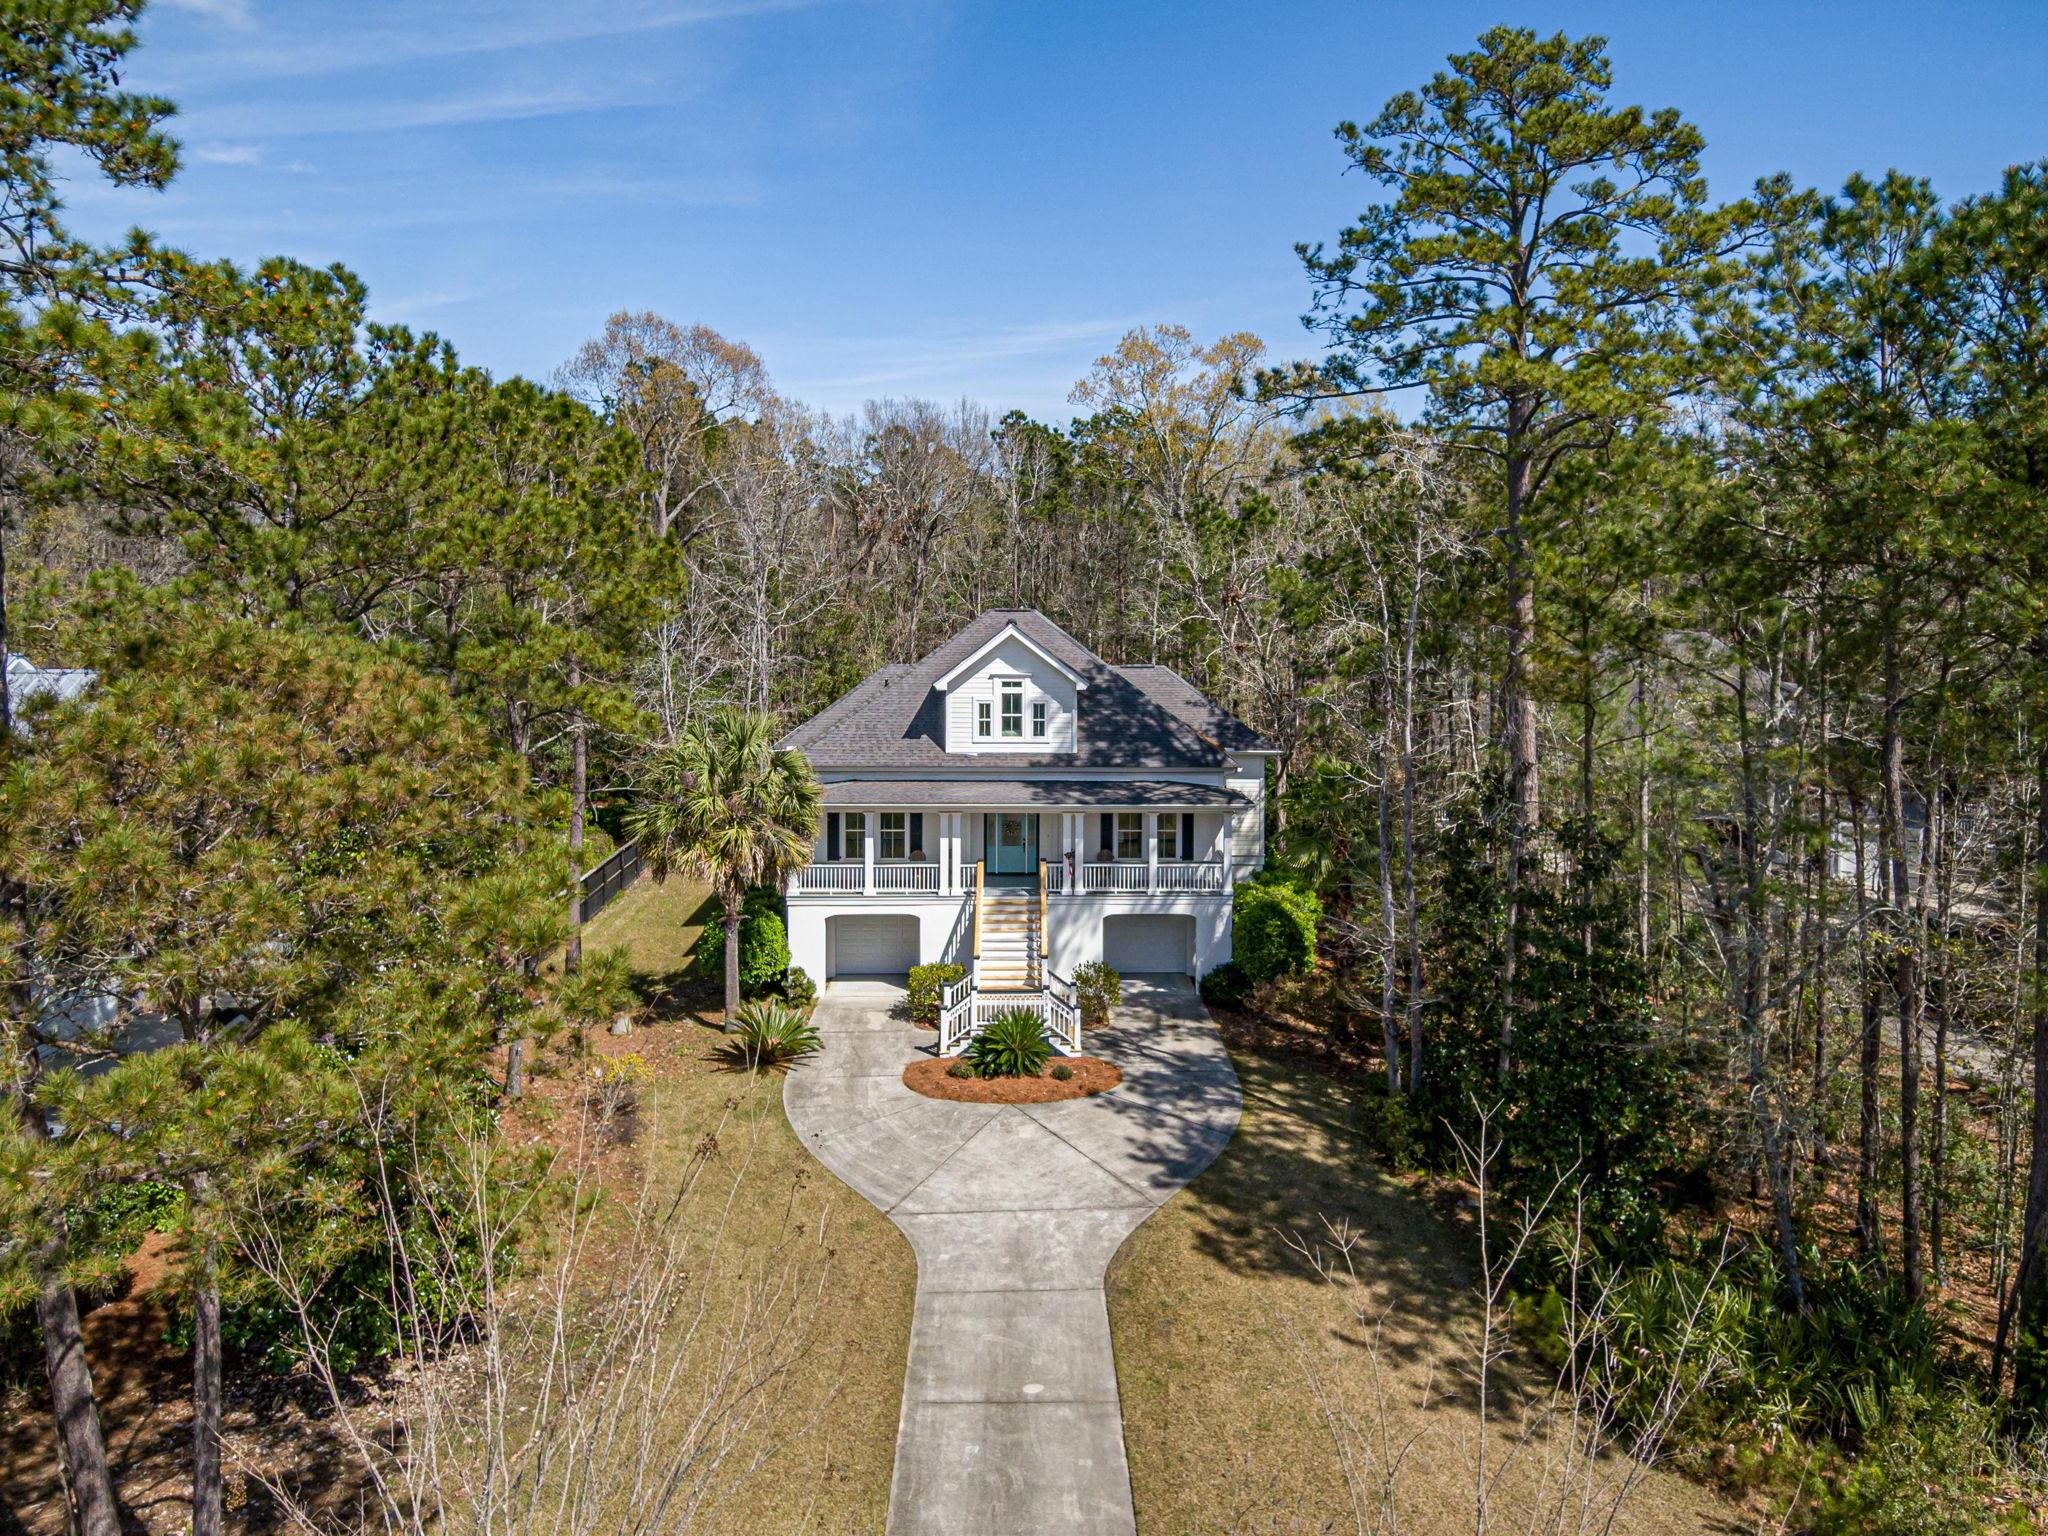 Darrell Creek Homes For Sale - 3794 Saint Ellens, Mount Pleasant, SC - 0